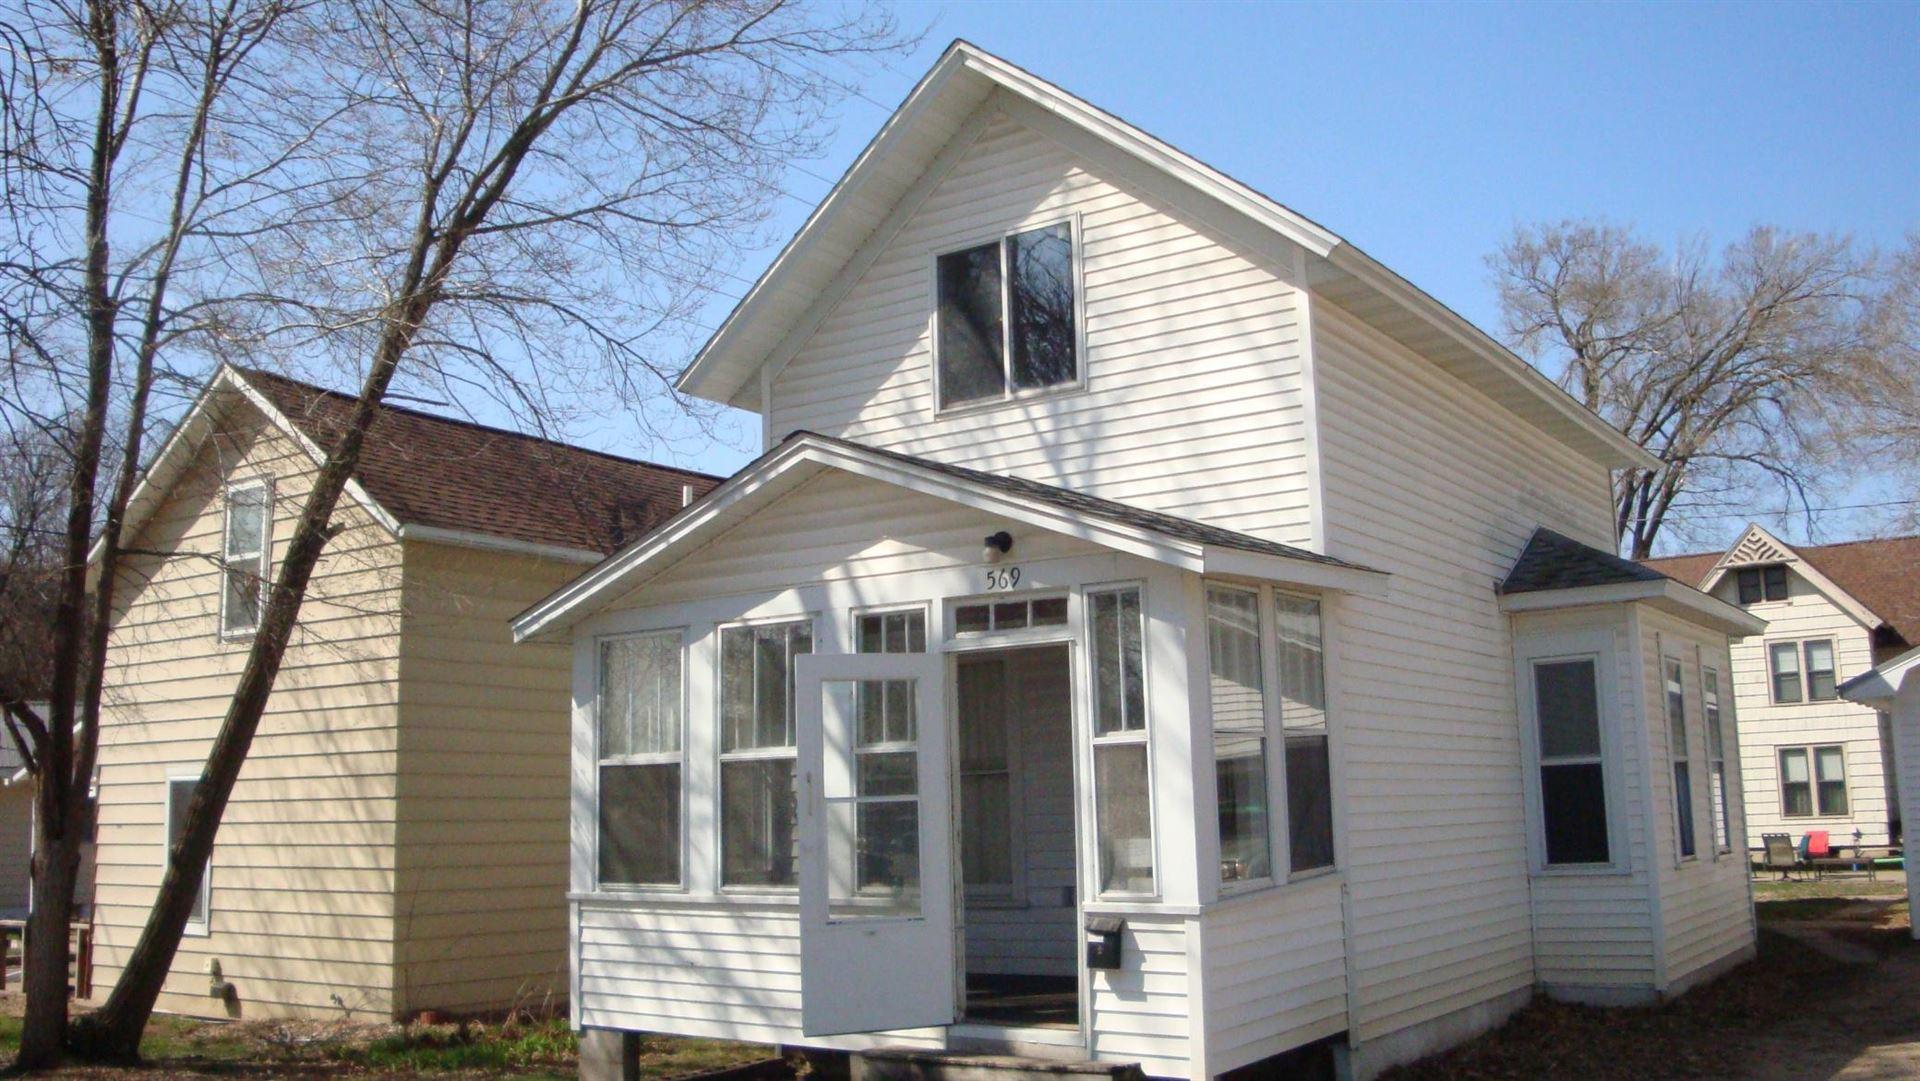 569 Garfield Street, Winona, MN 55987 - MLS#: 5736988